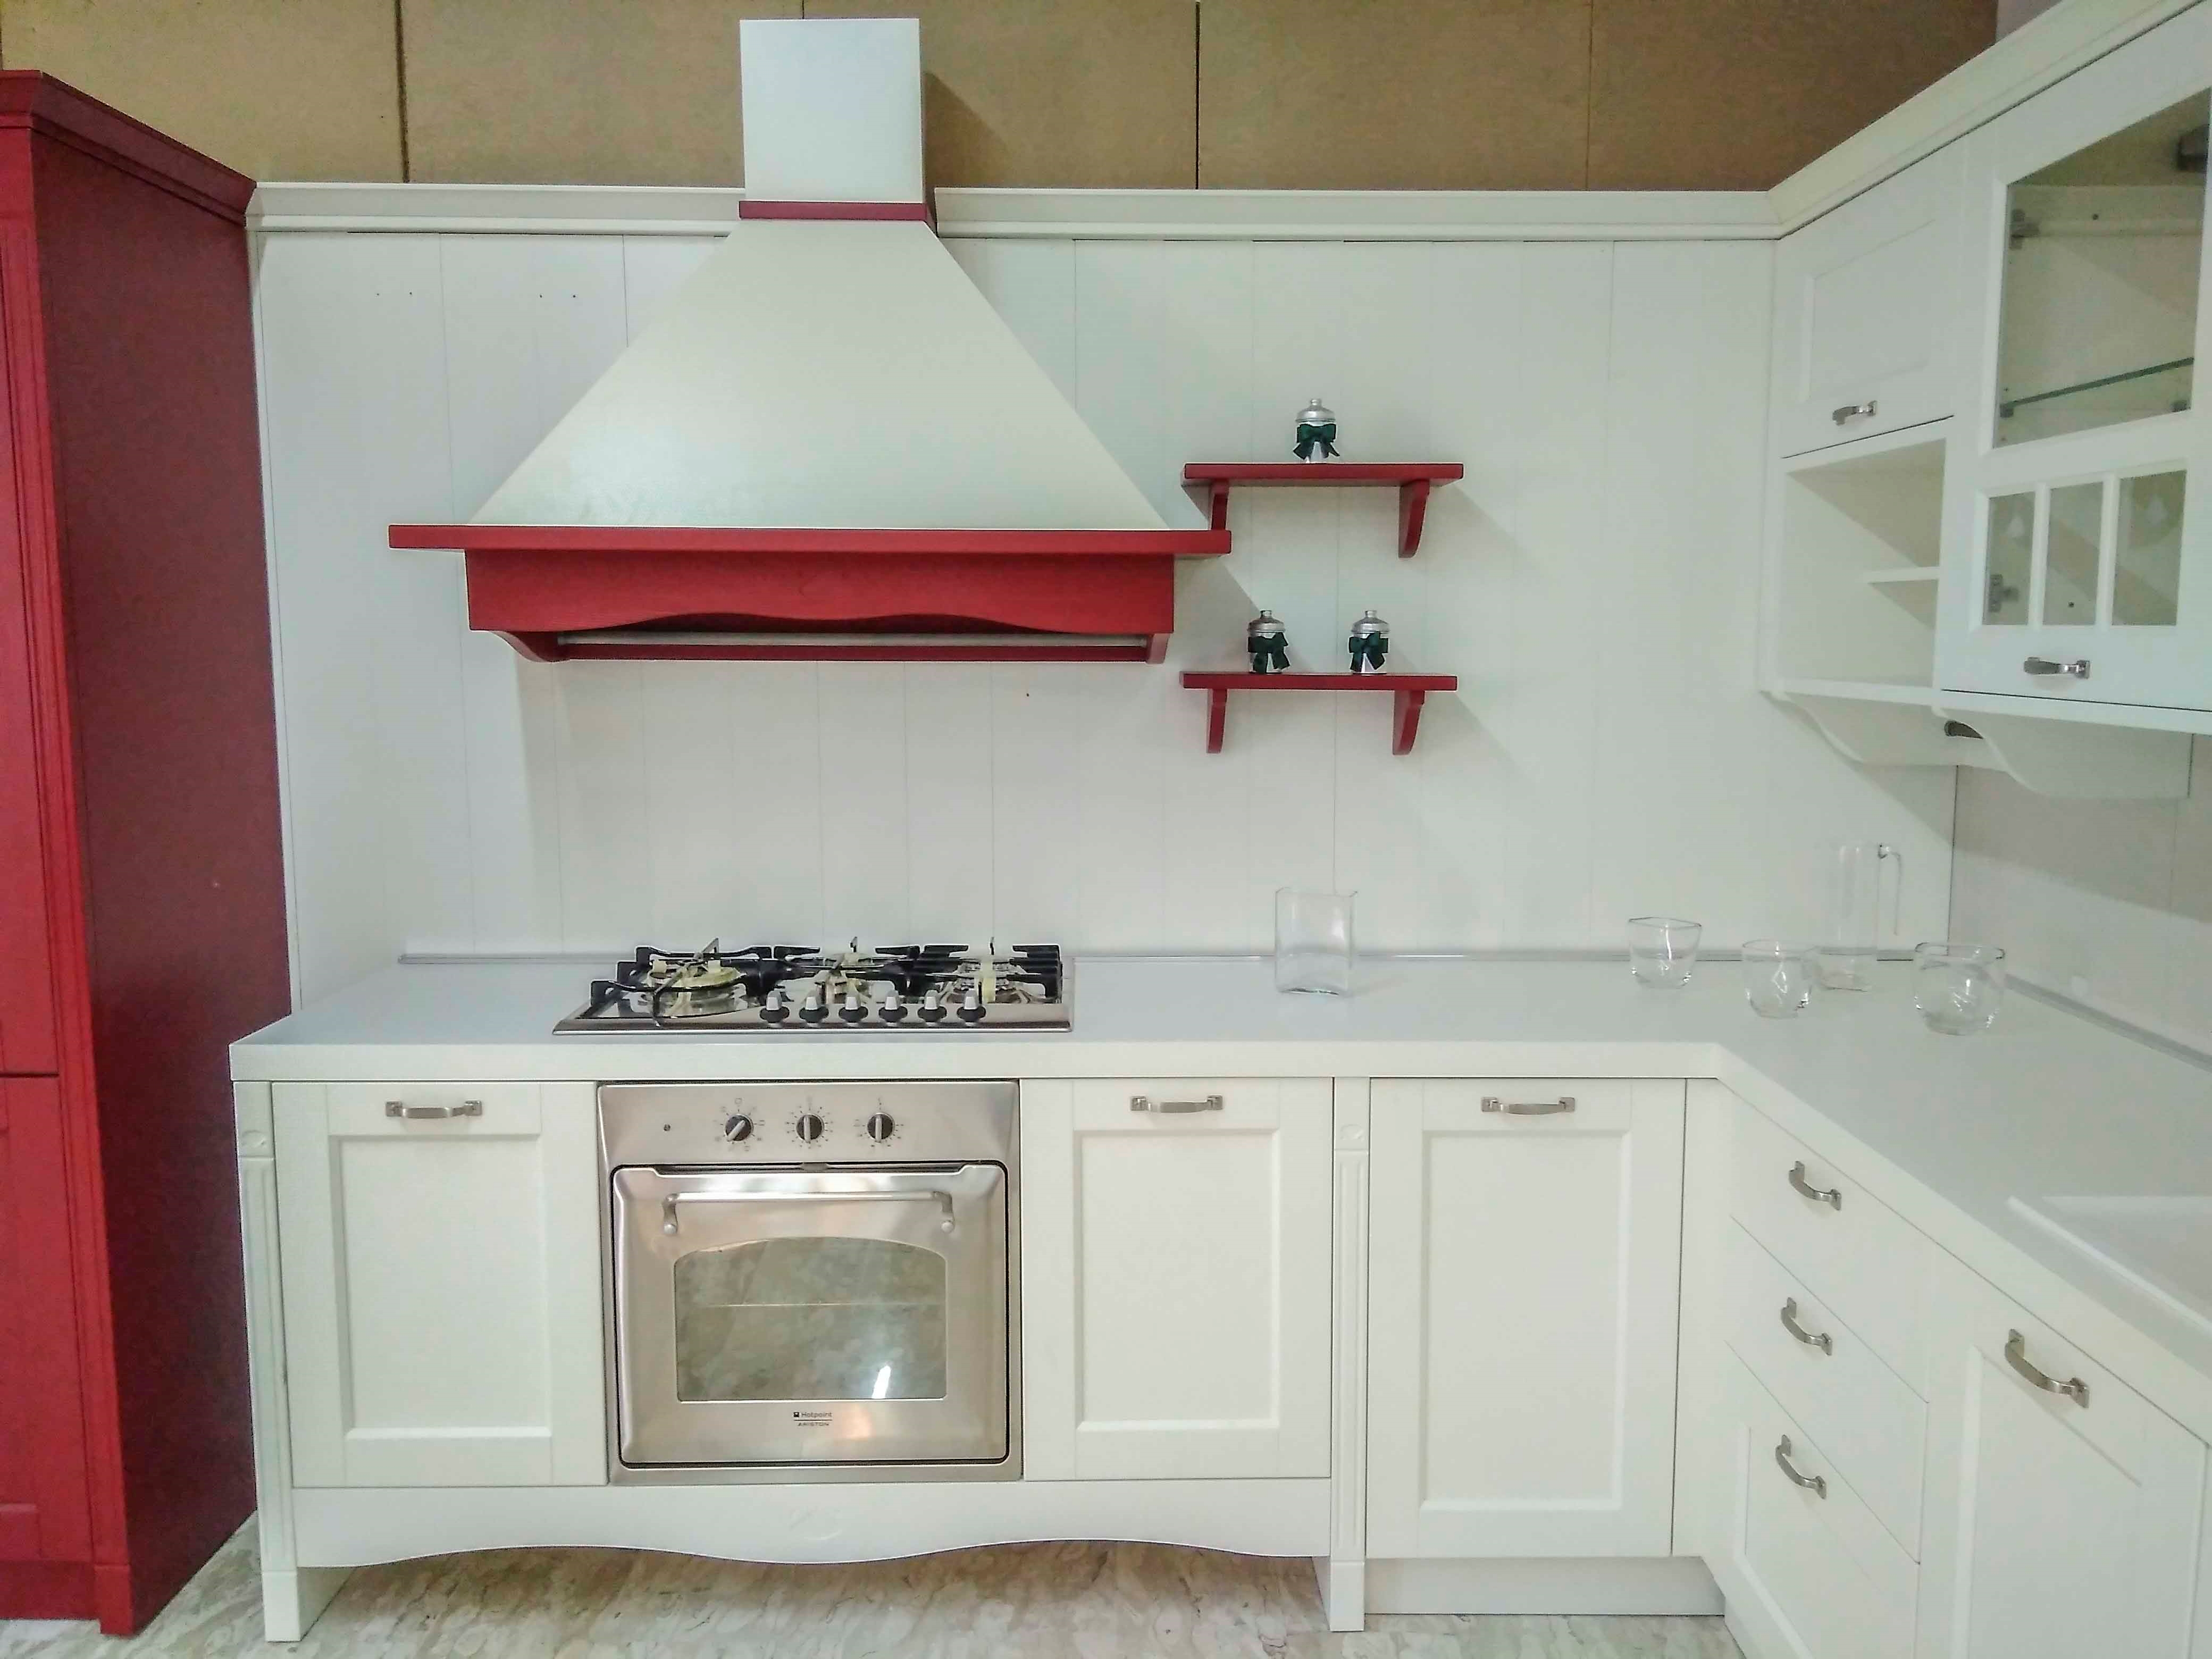 Veneta Cucine Cucina Gretha scontato del -60 % - Cucine a prezzi ...